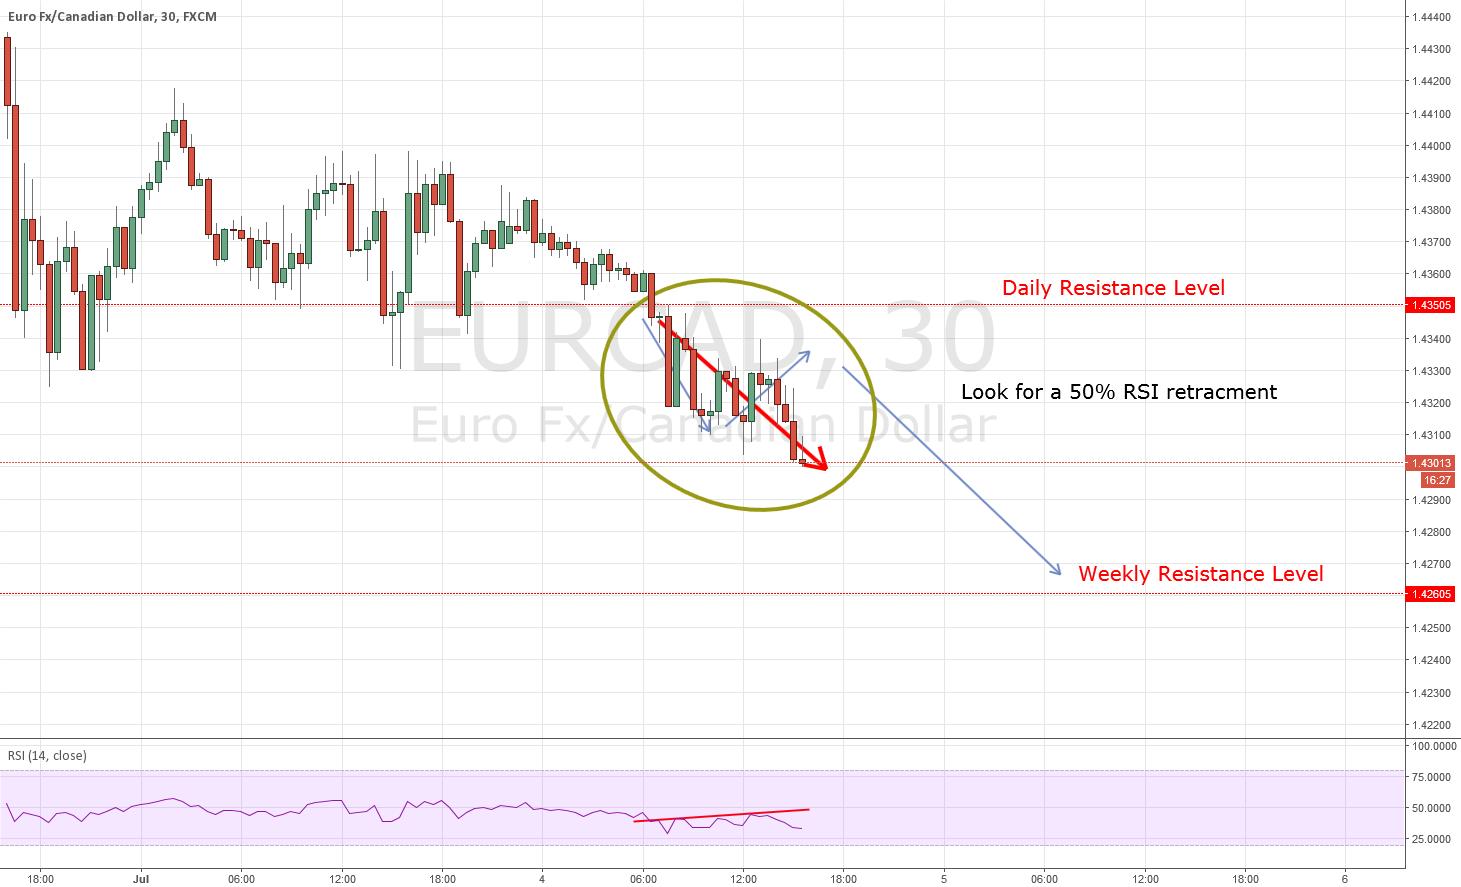 EURCAD: Possible Reversal Very Soon